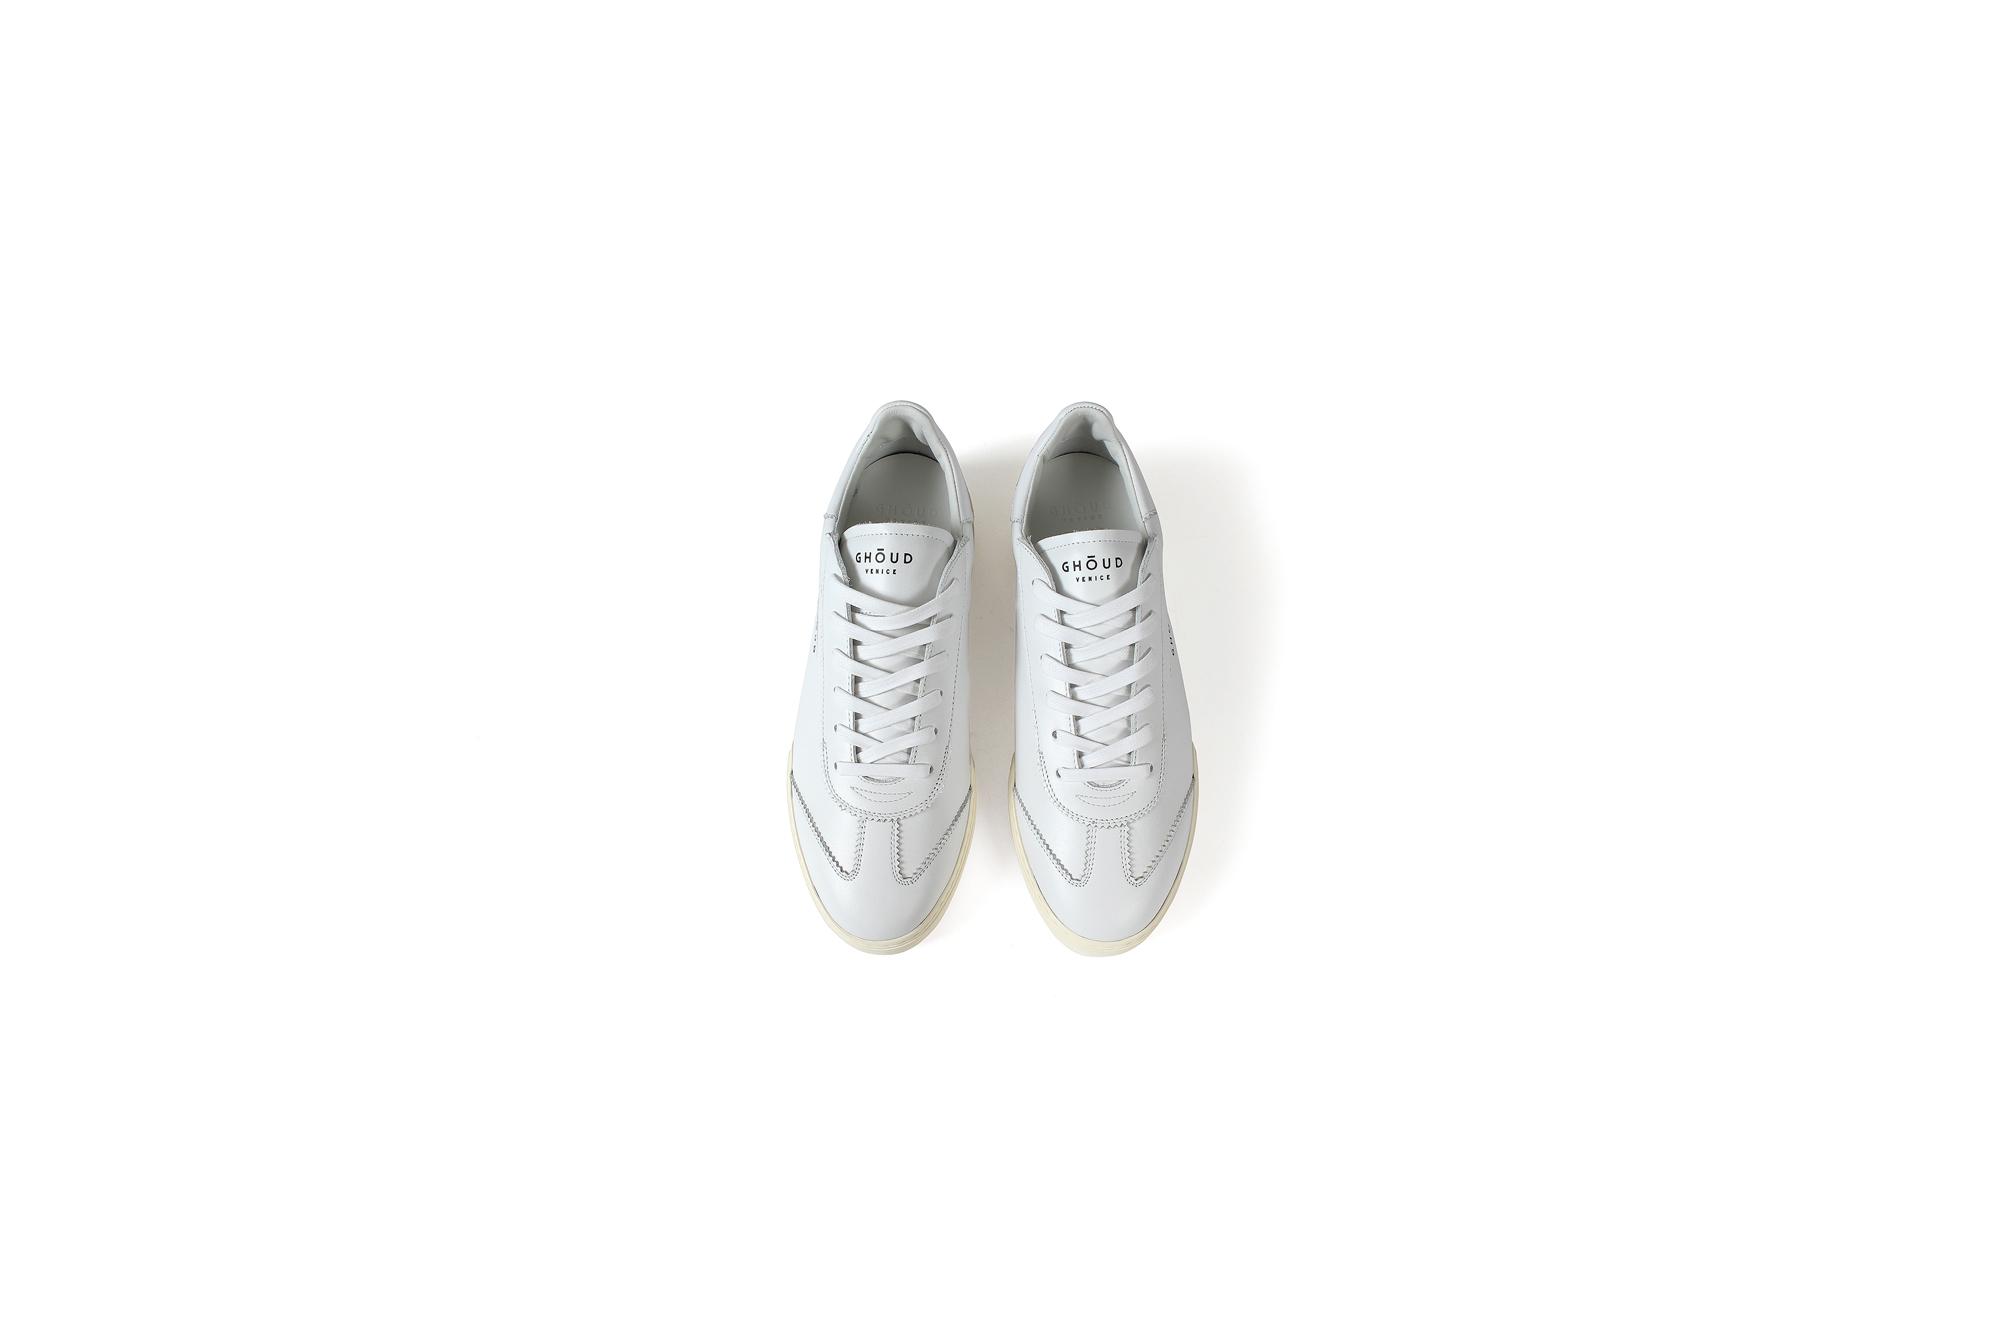 GHOUD (ゴード) LOB 01 レザースニーカー WHITE/WHITE (ホワイト/ホワイト) made in italy (イタリア製) 2021 春夏新作 愛知 名古屋 ALto e Diritto altoediritto アルトエデリット 白スニーカー